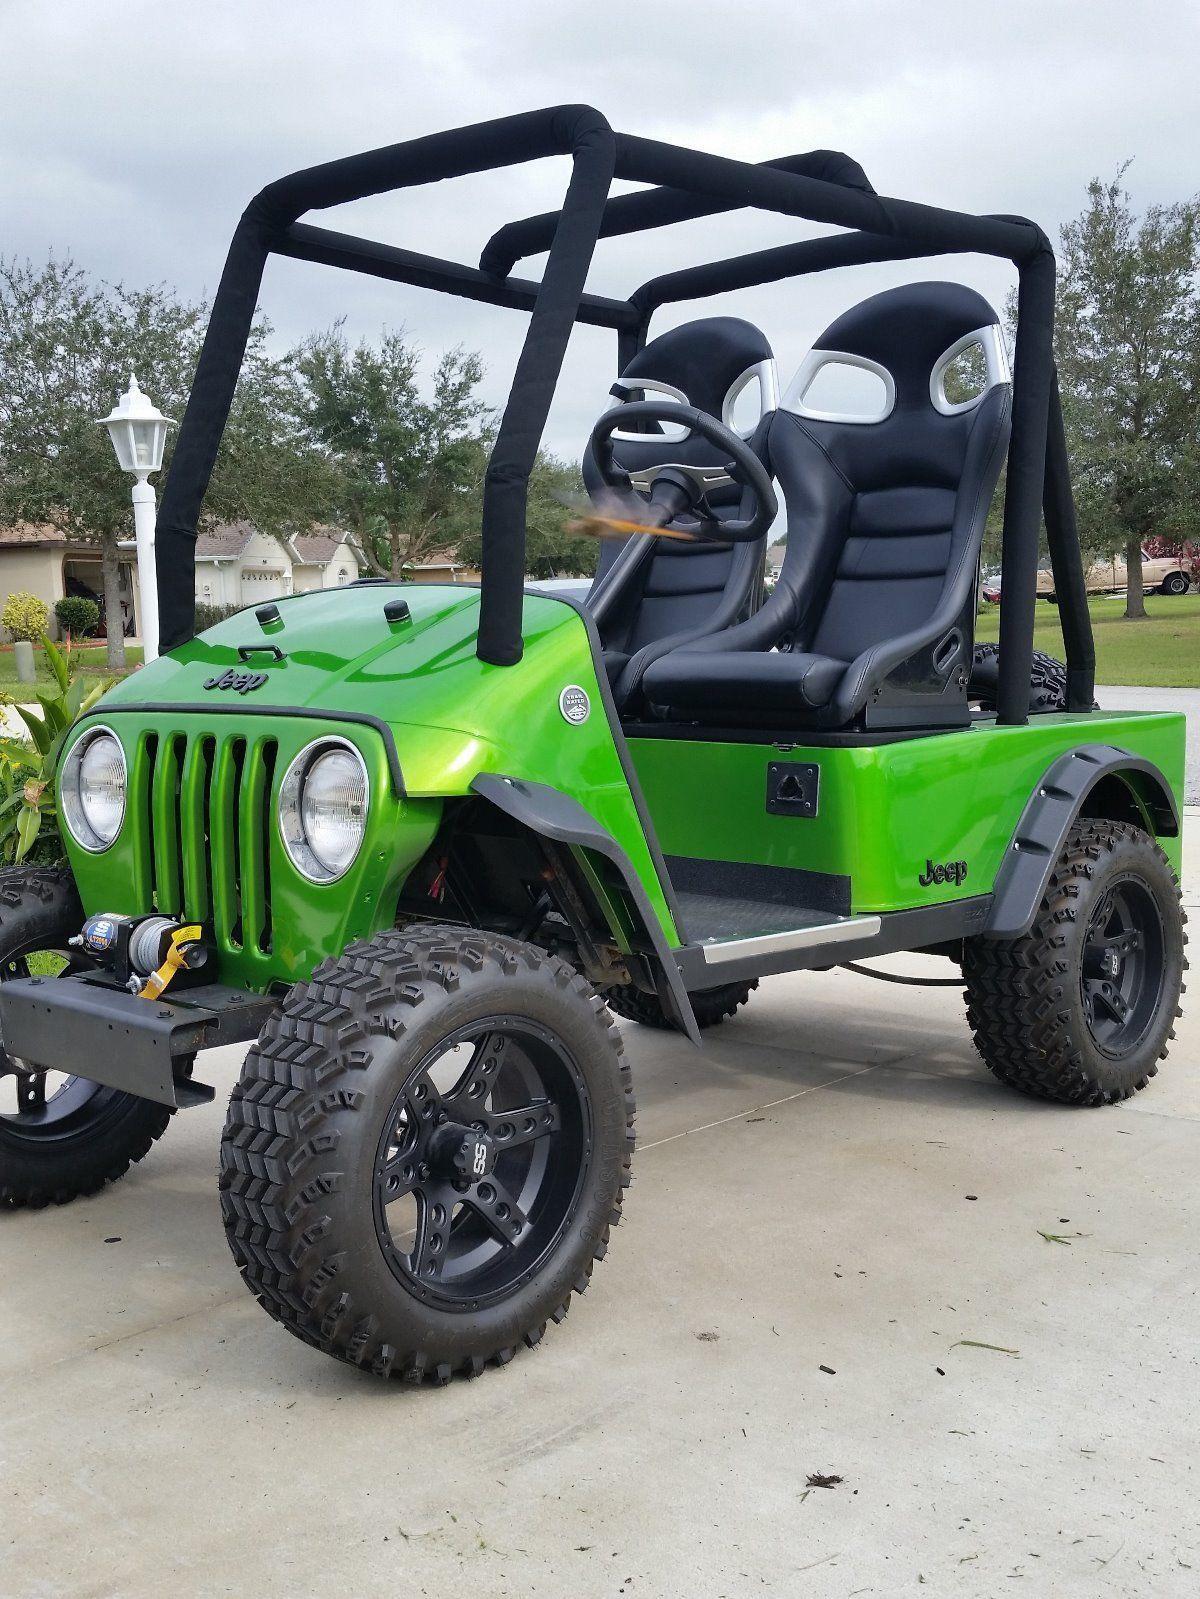 Ezgo Txt 2011 Golf Cart Jeep For Sale